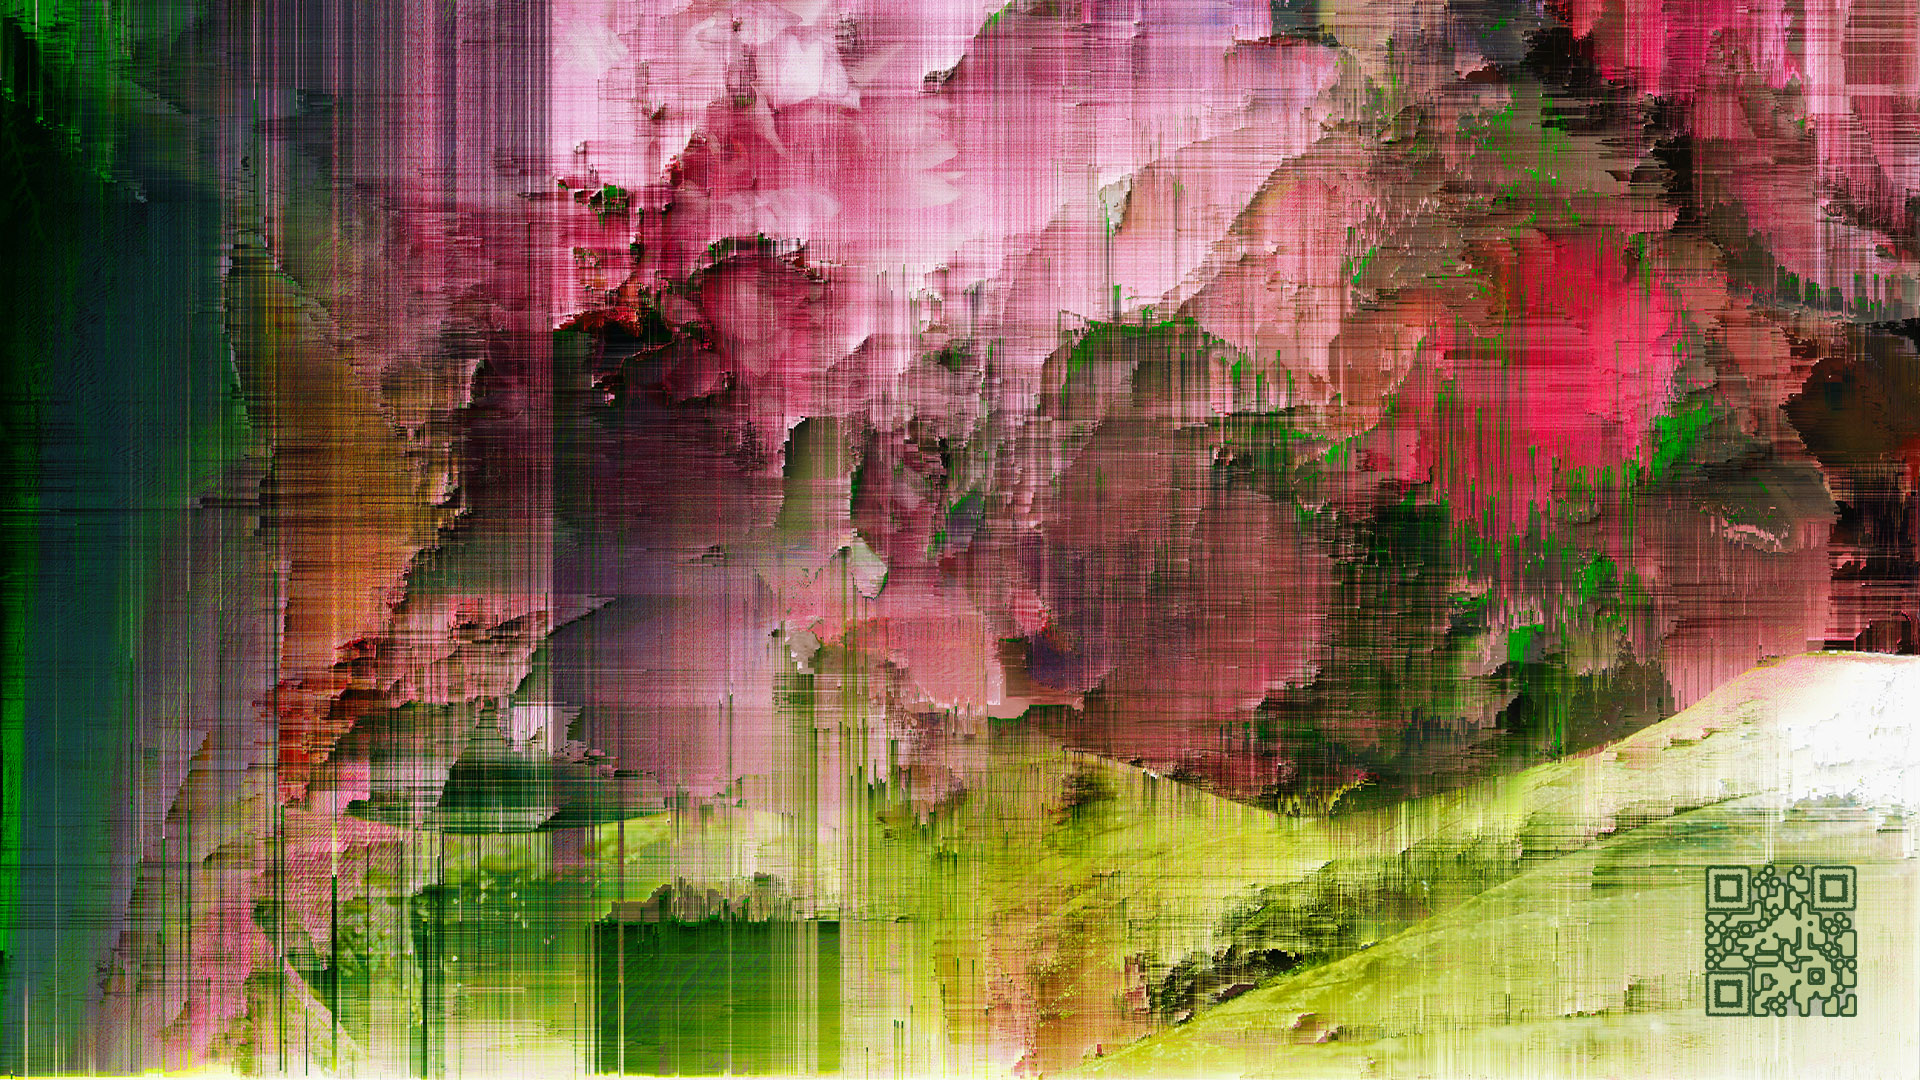 Artwork, untitled